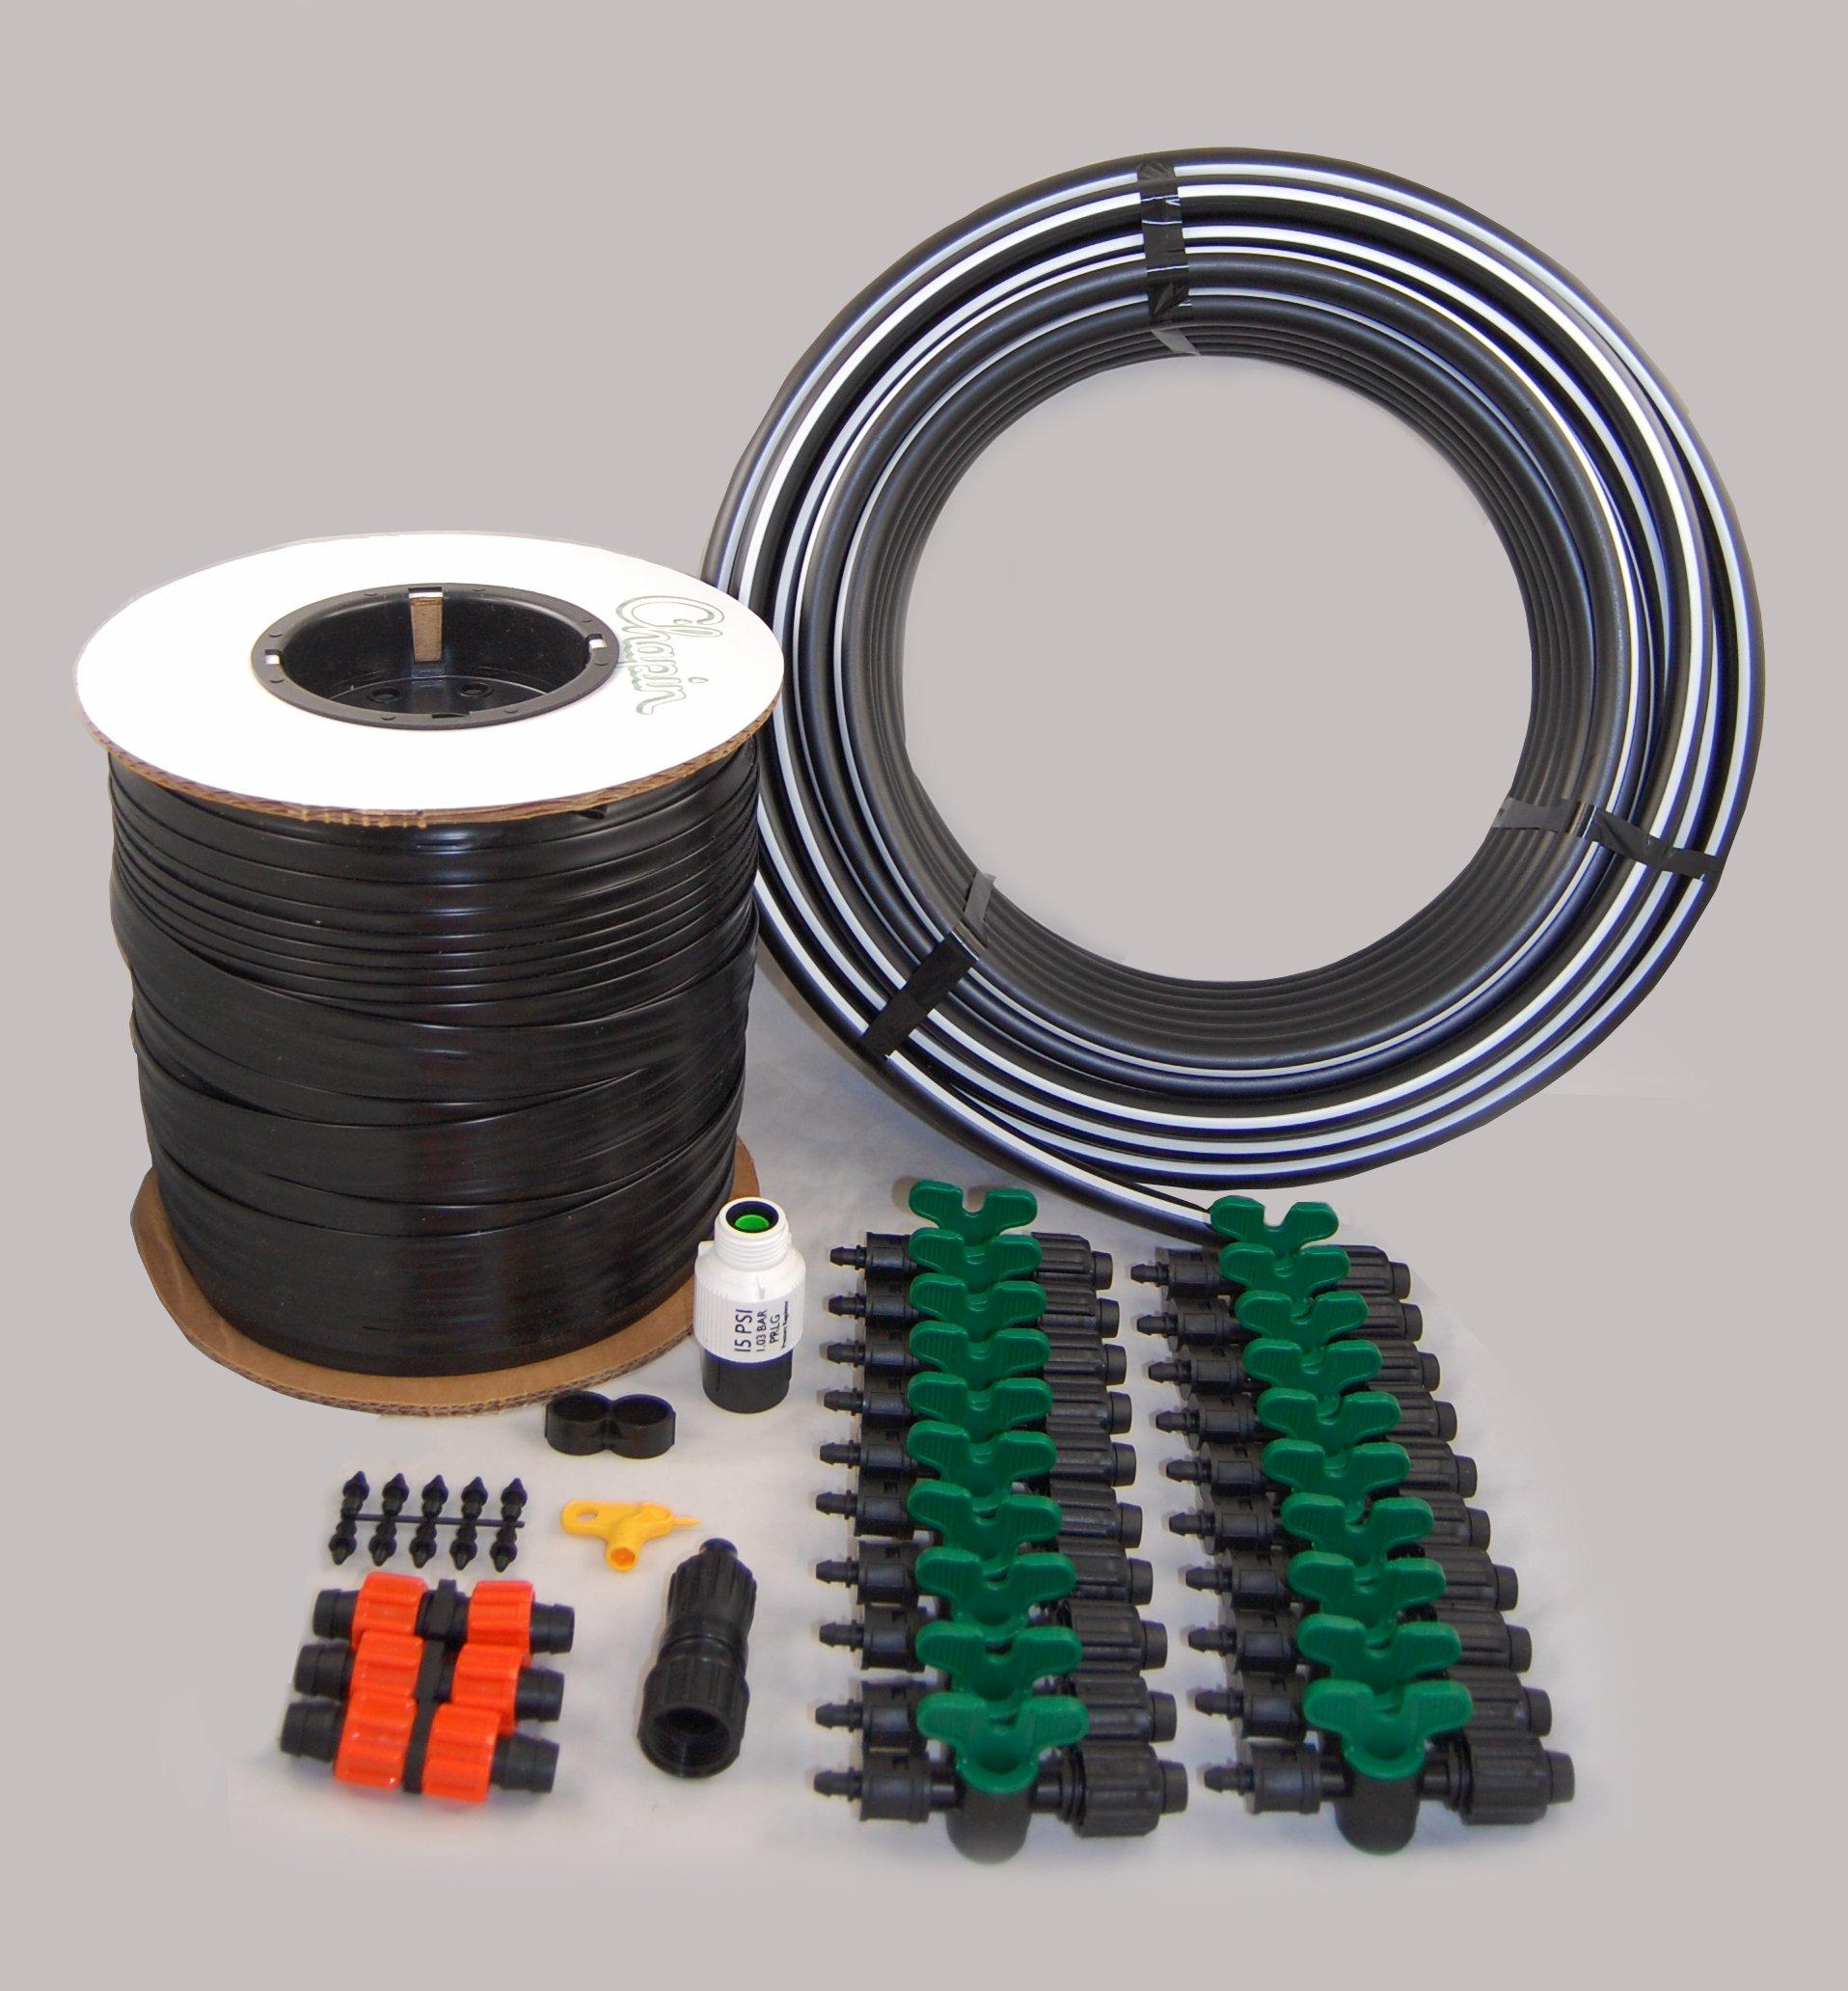 Vegetable Garden Drip Kit – 20 Rows x 50 Ft– Watering Garden Drip Irrigation